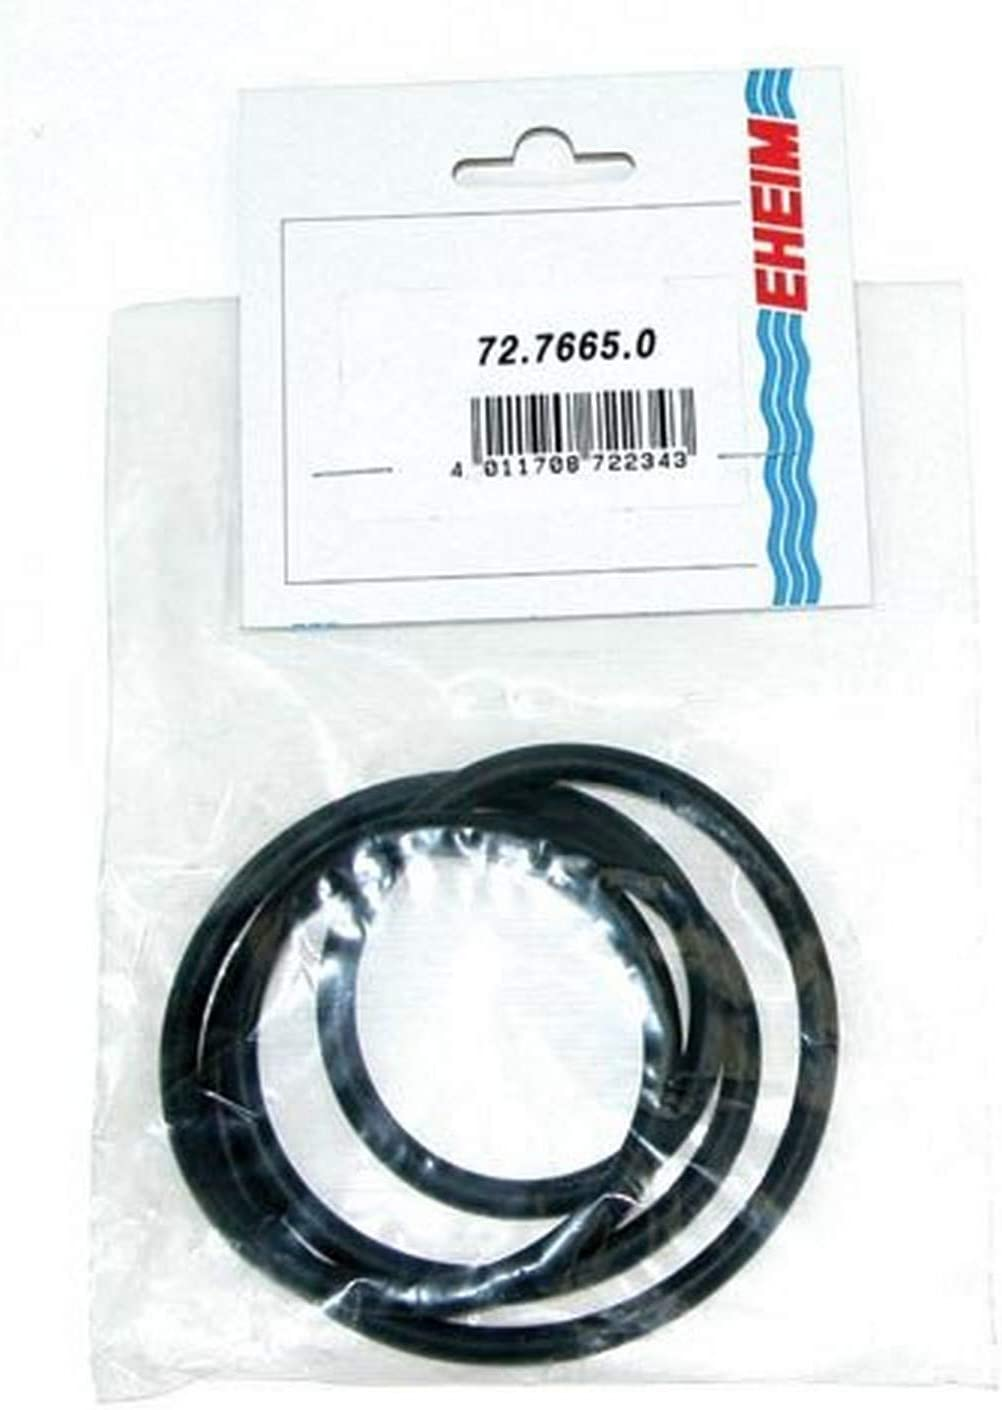 Eheim AEH7276650 Canister O-Ring 2250/60 for Aquarium Water Pump